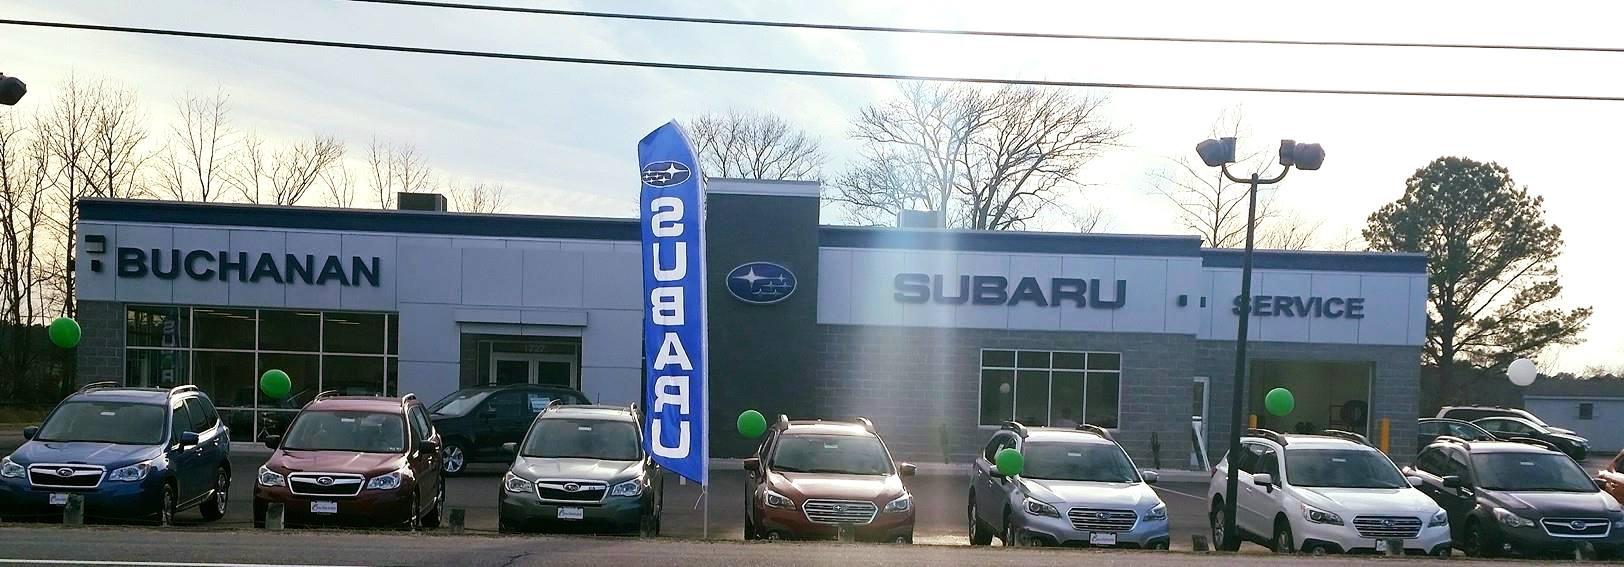 About Buchanan Subaru Of Pocomoke New Subaru Used Car Dealer - Subaru dealership maryland